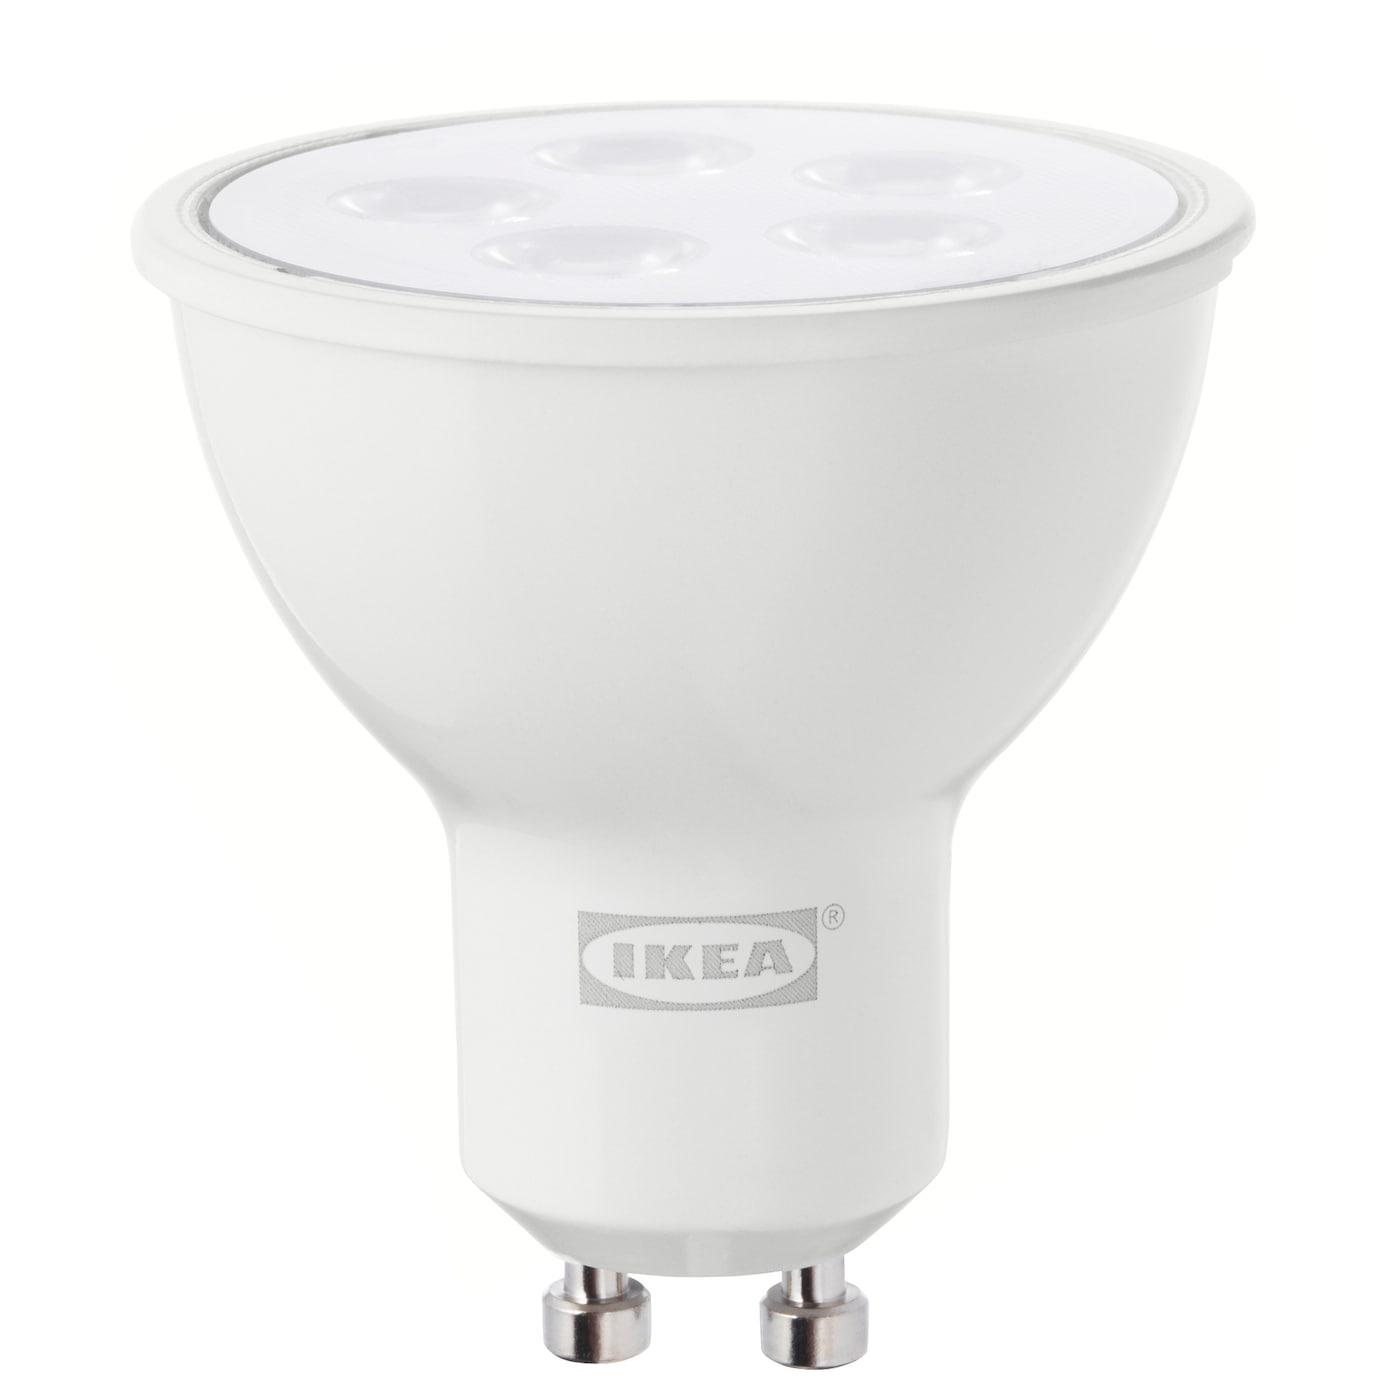 Smart Lighting Wireless Remote Control Ikea Wiring A Light Bulb Fitting Trdfri Led Gu10 400 Lumen